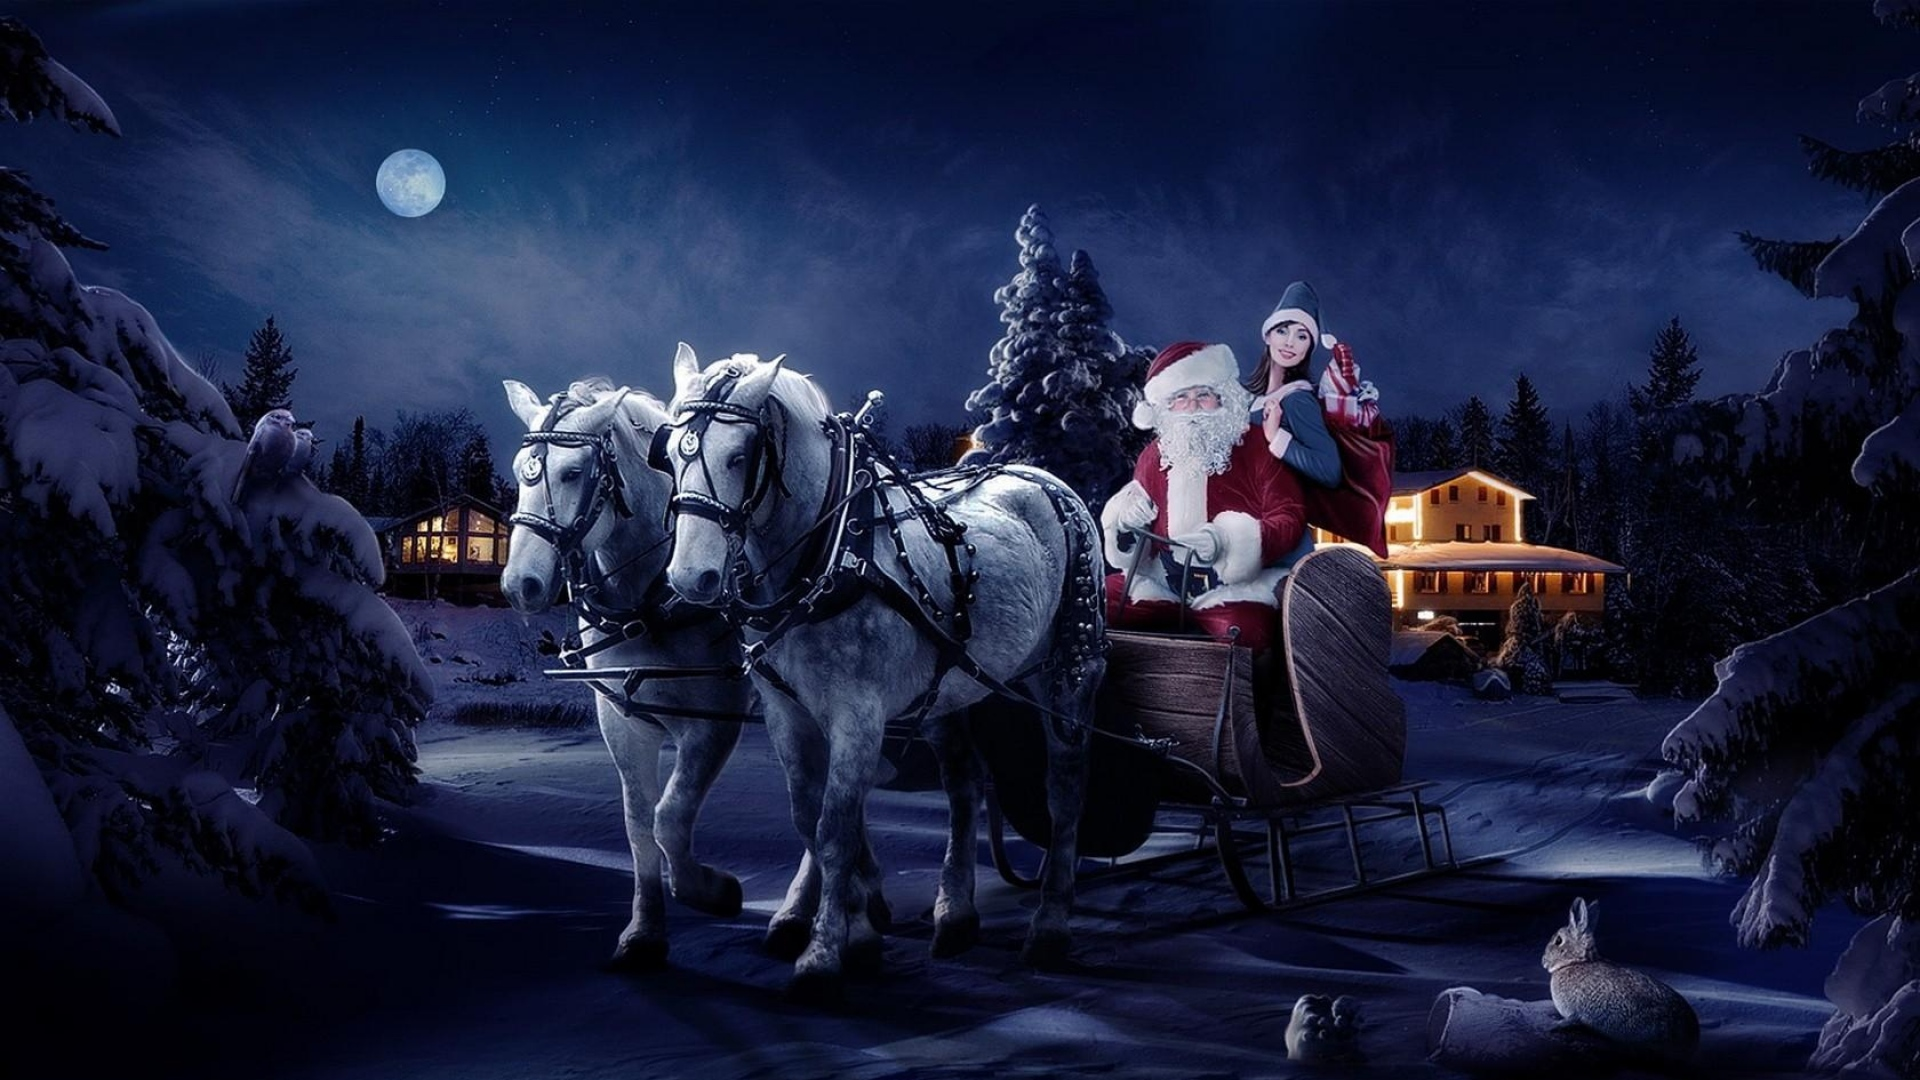 download wallpaper 1920x1080 santa claus reindeer sleigh gifts